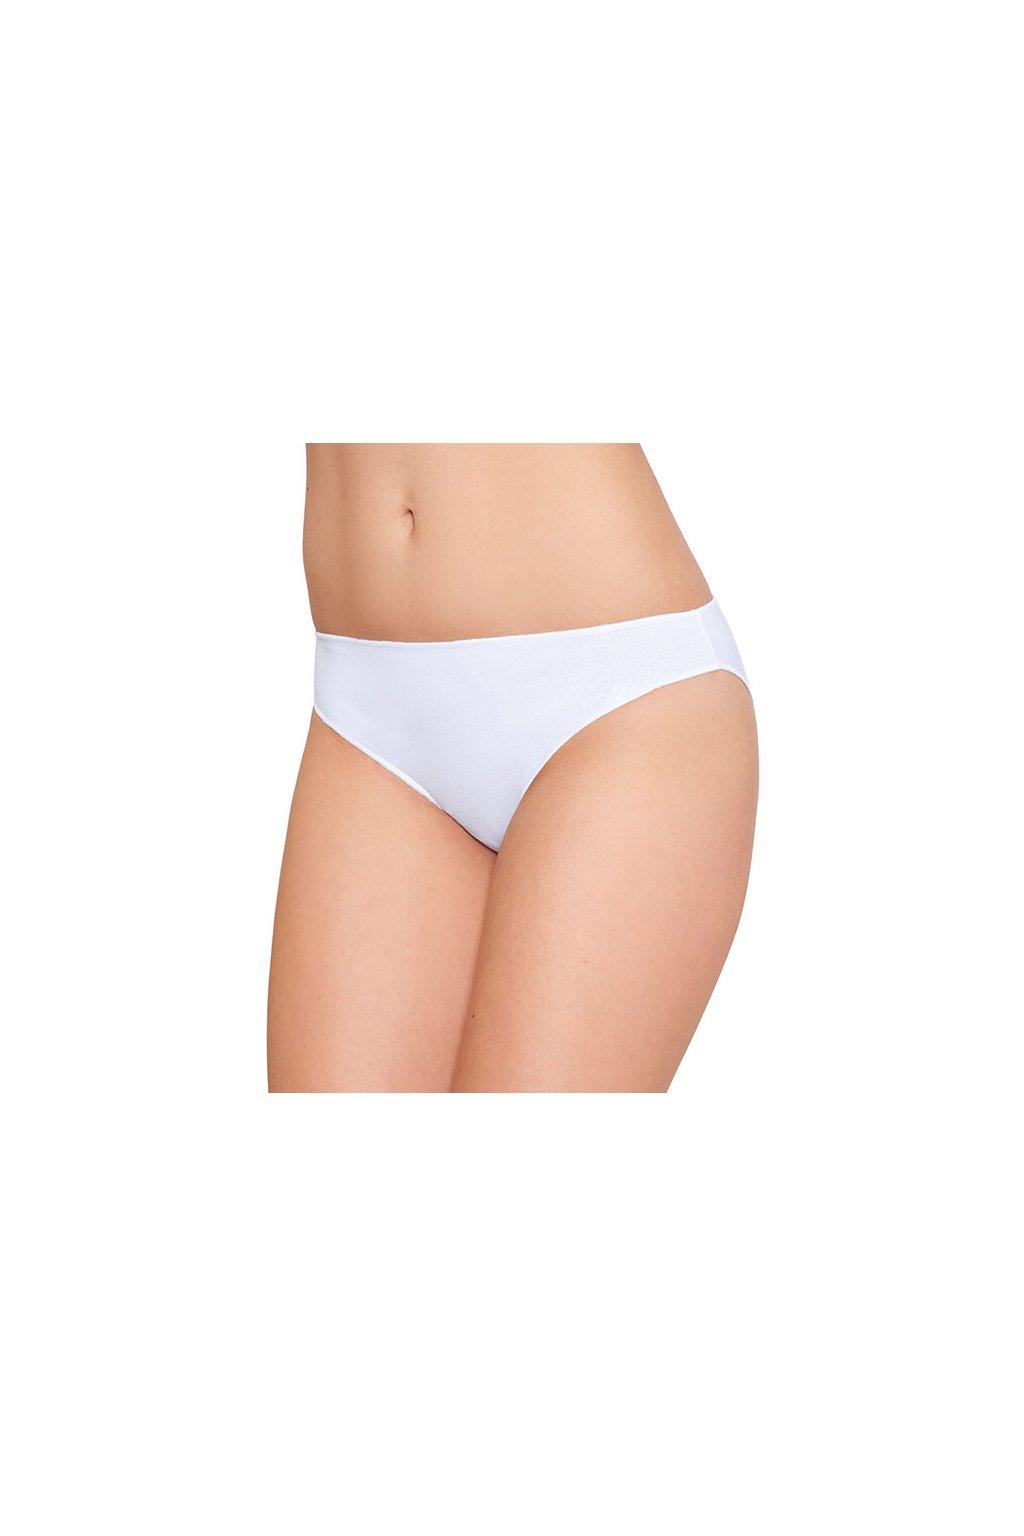 Dámské kalhotky, 10089 1, bílá